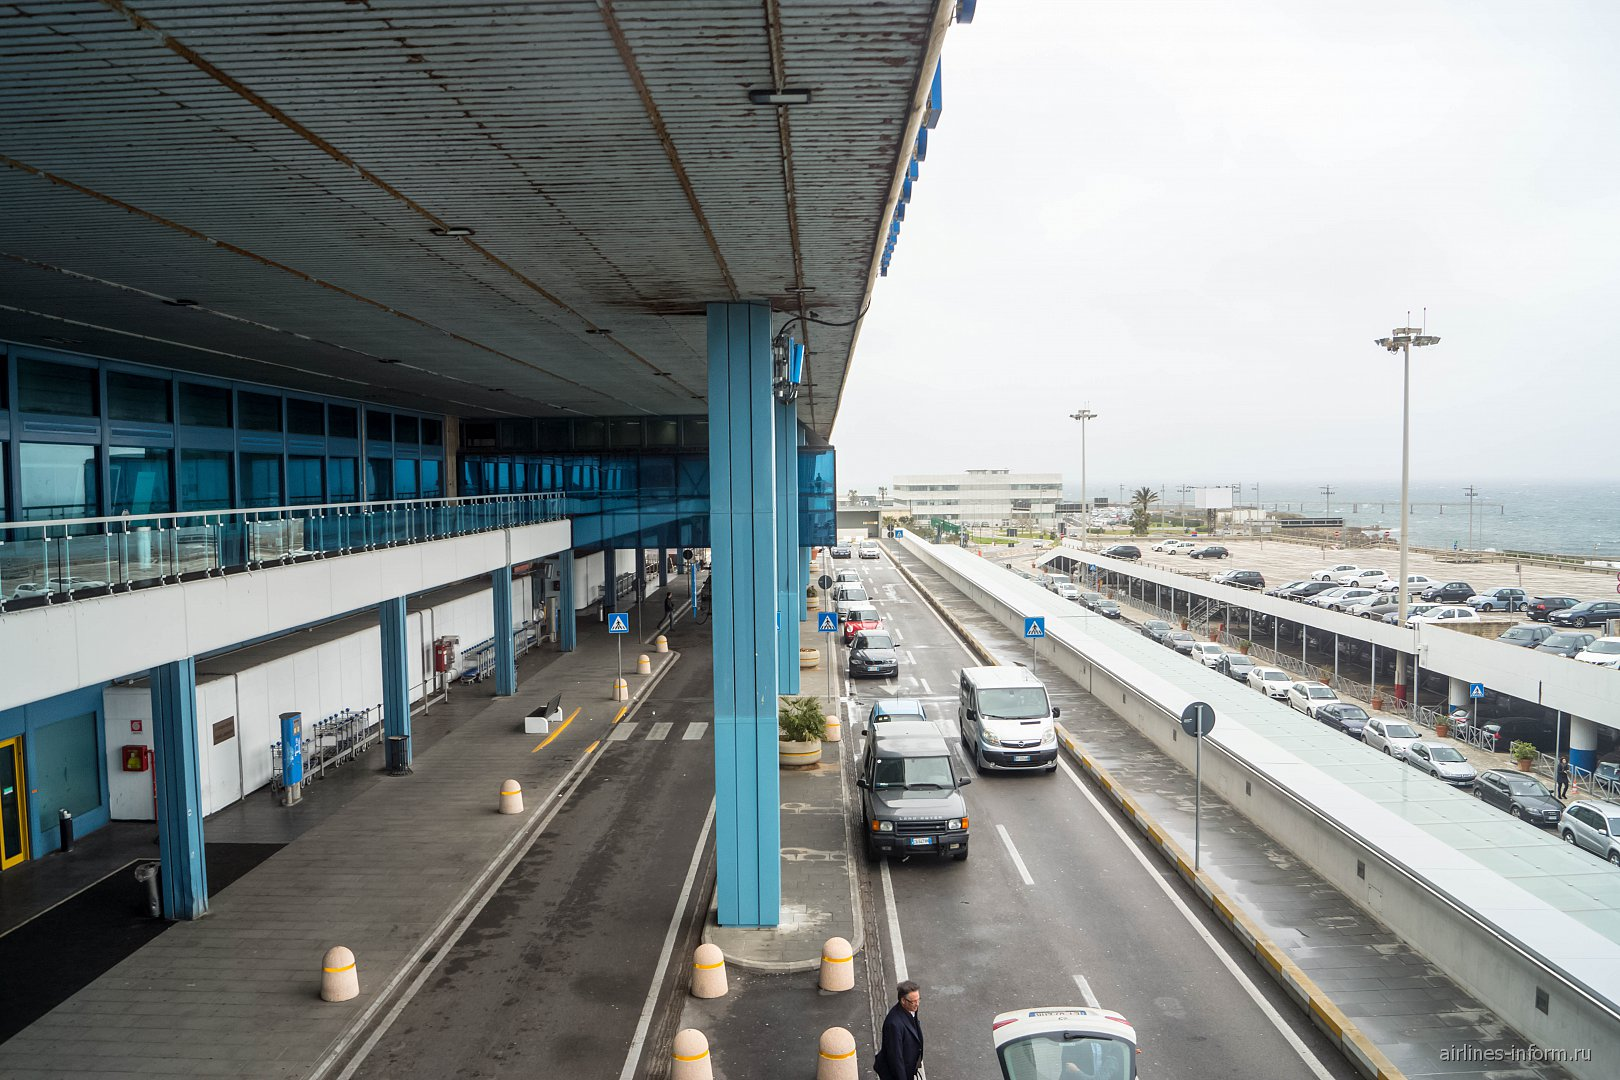 Подъезд к зоне вылета в аэропорту Палермо